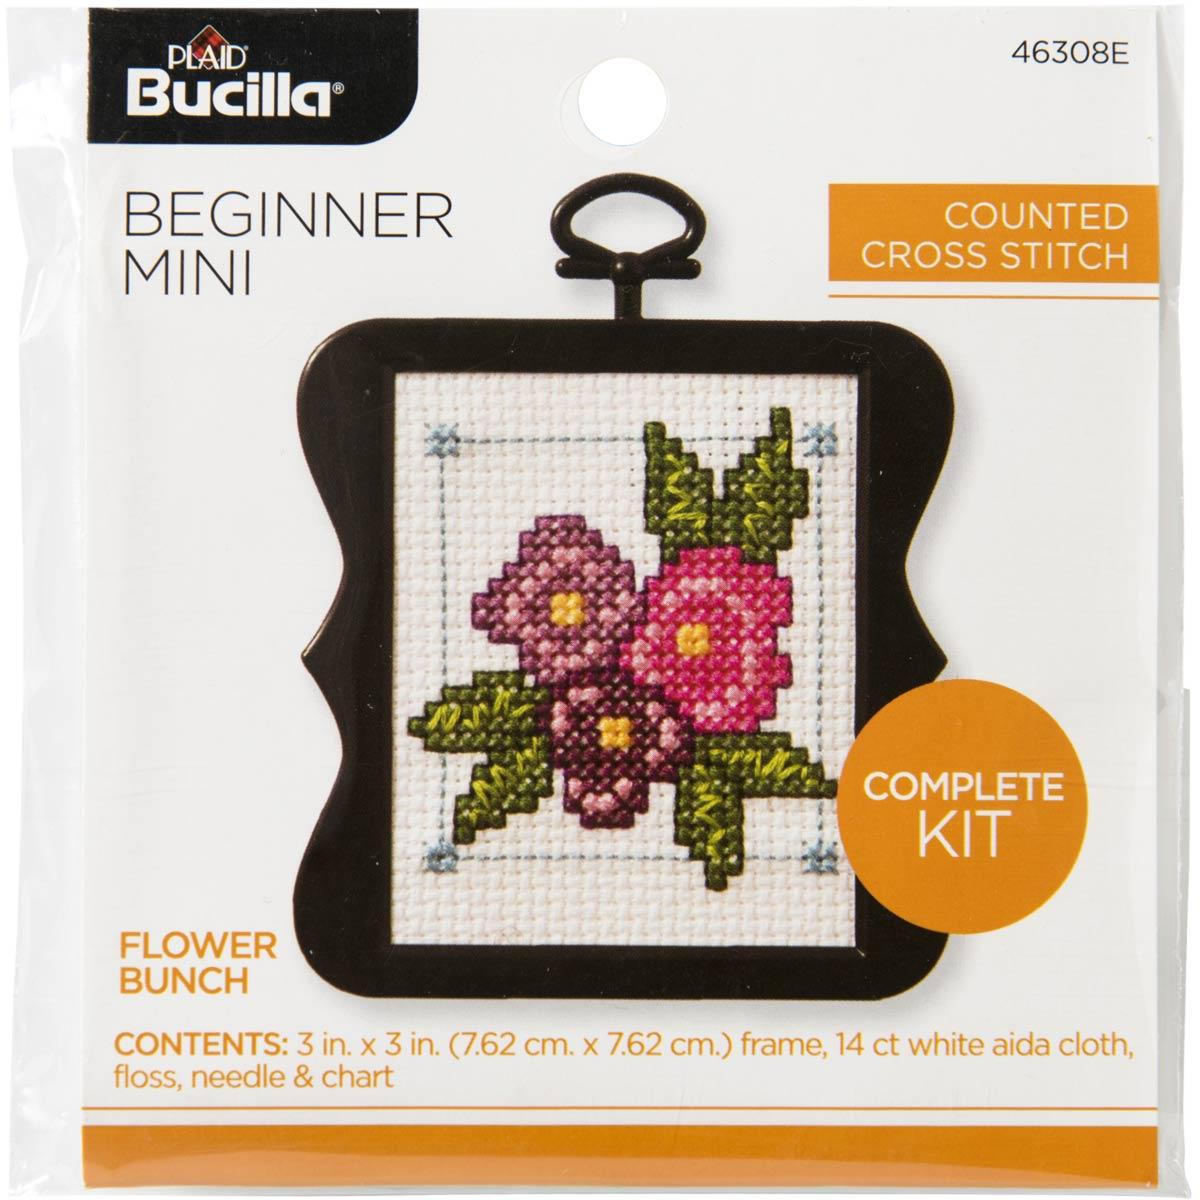 Bucilla ® Counted Cross Stitch - Beginner Stitchery - Mini - Flower Bunch